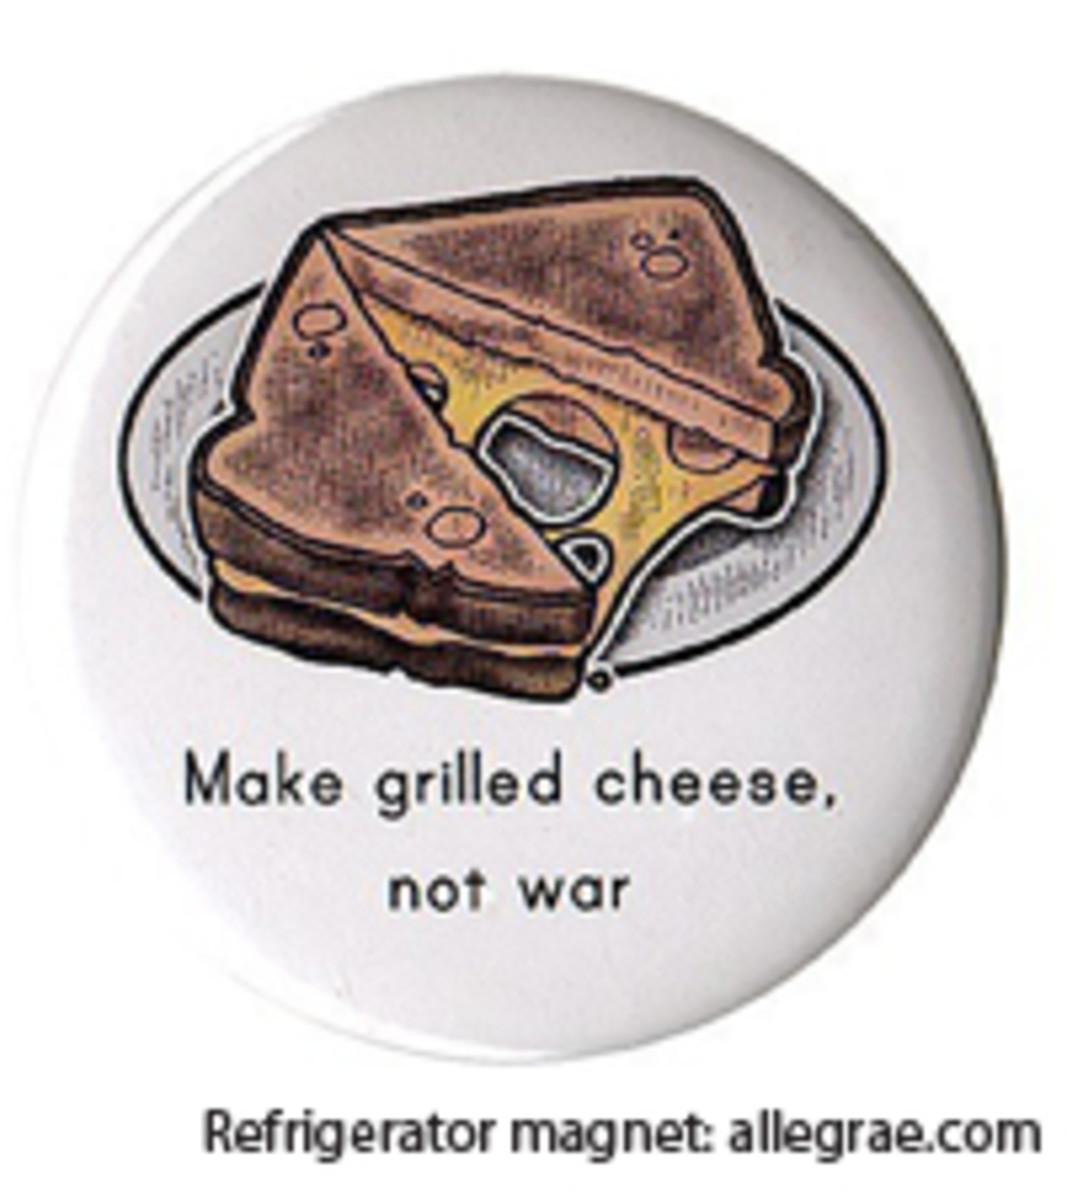 grilledcheesebutton1